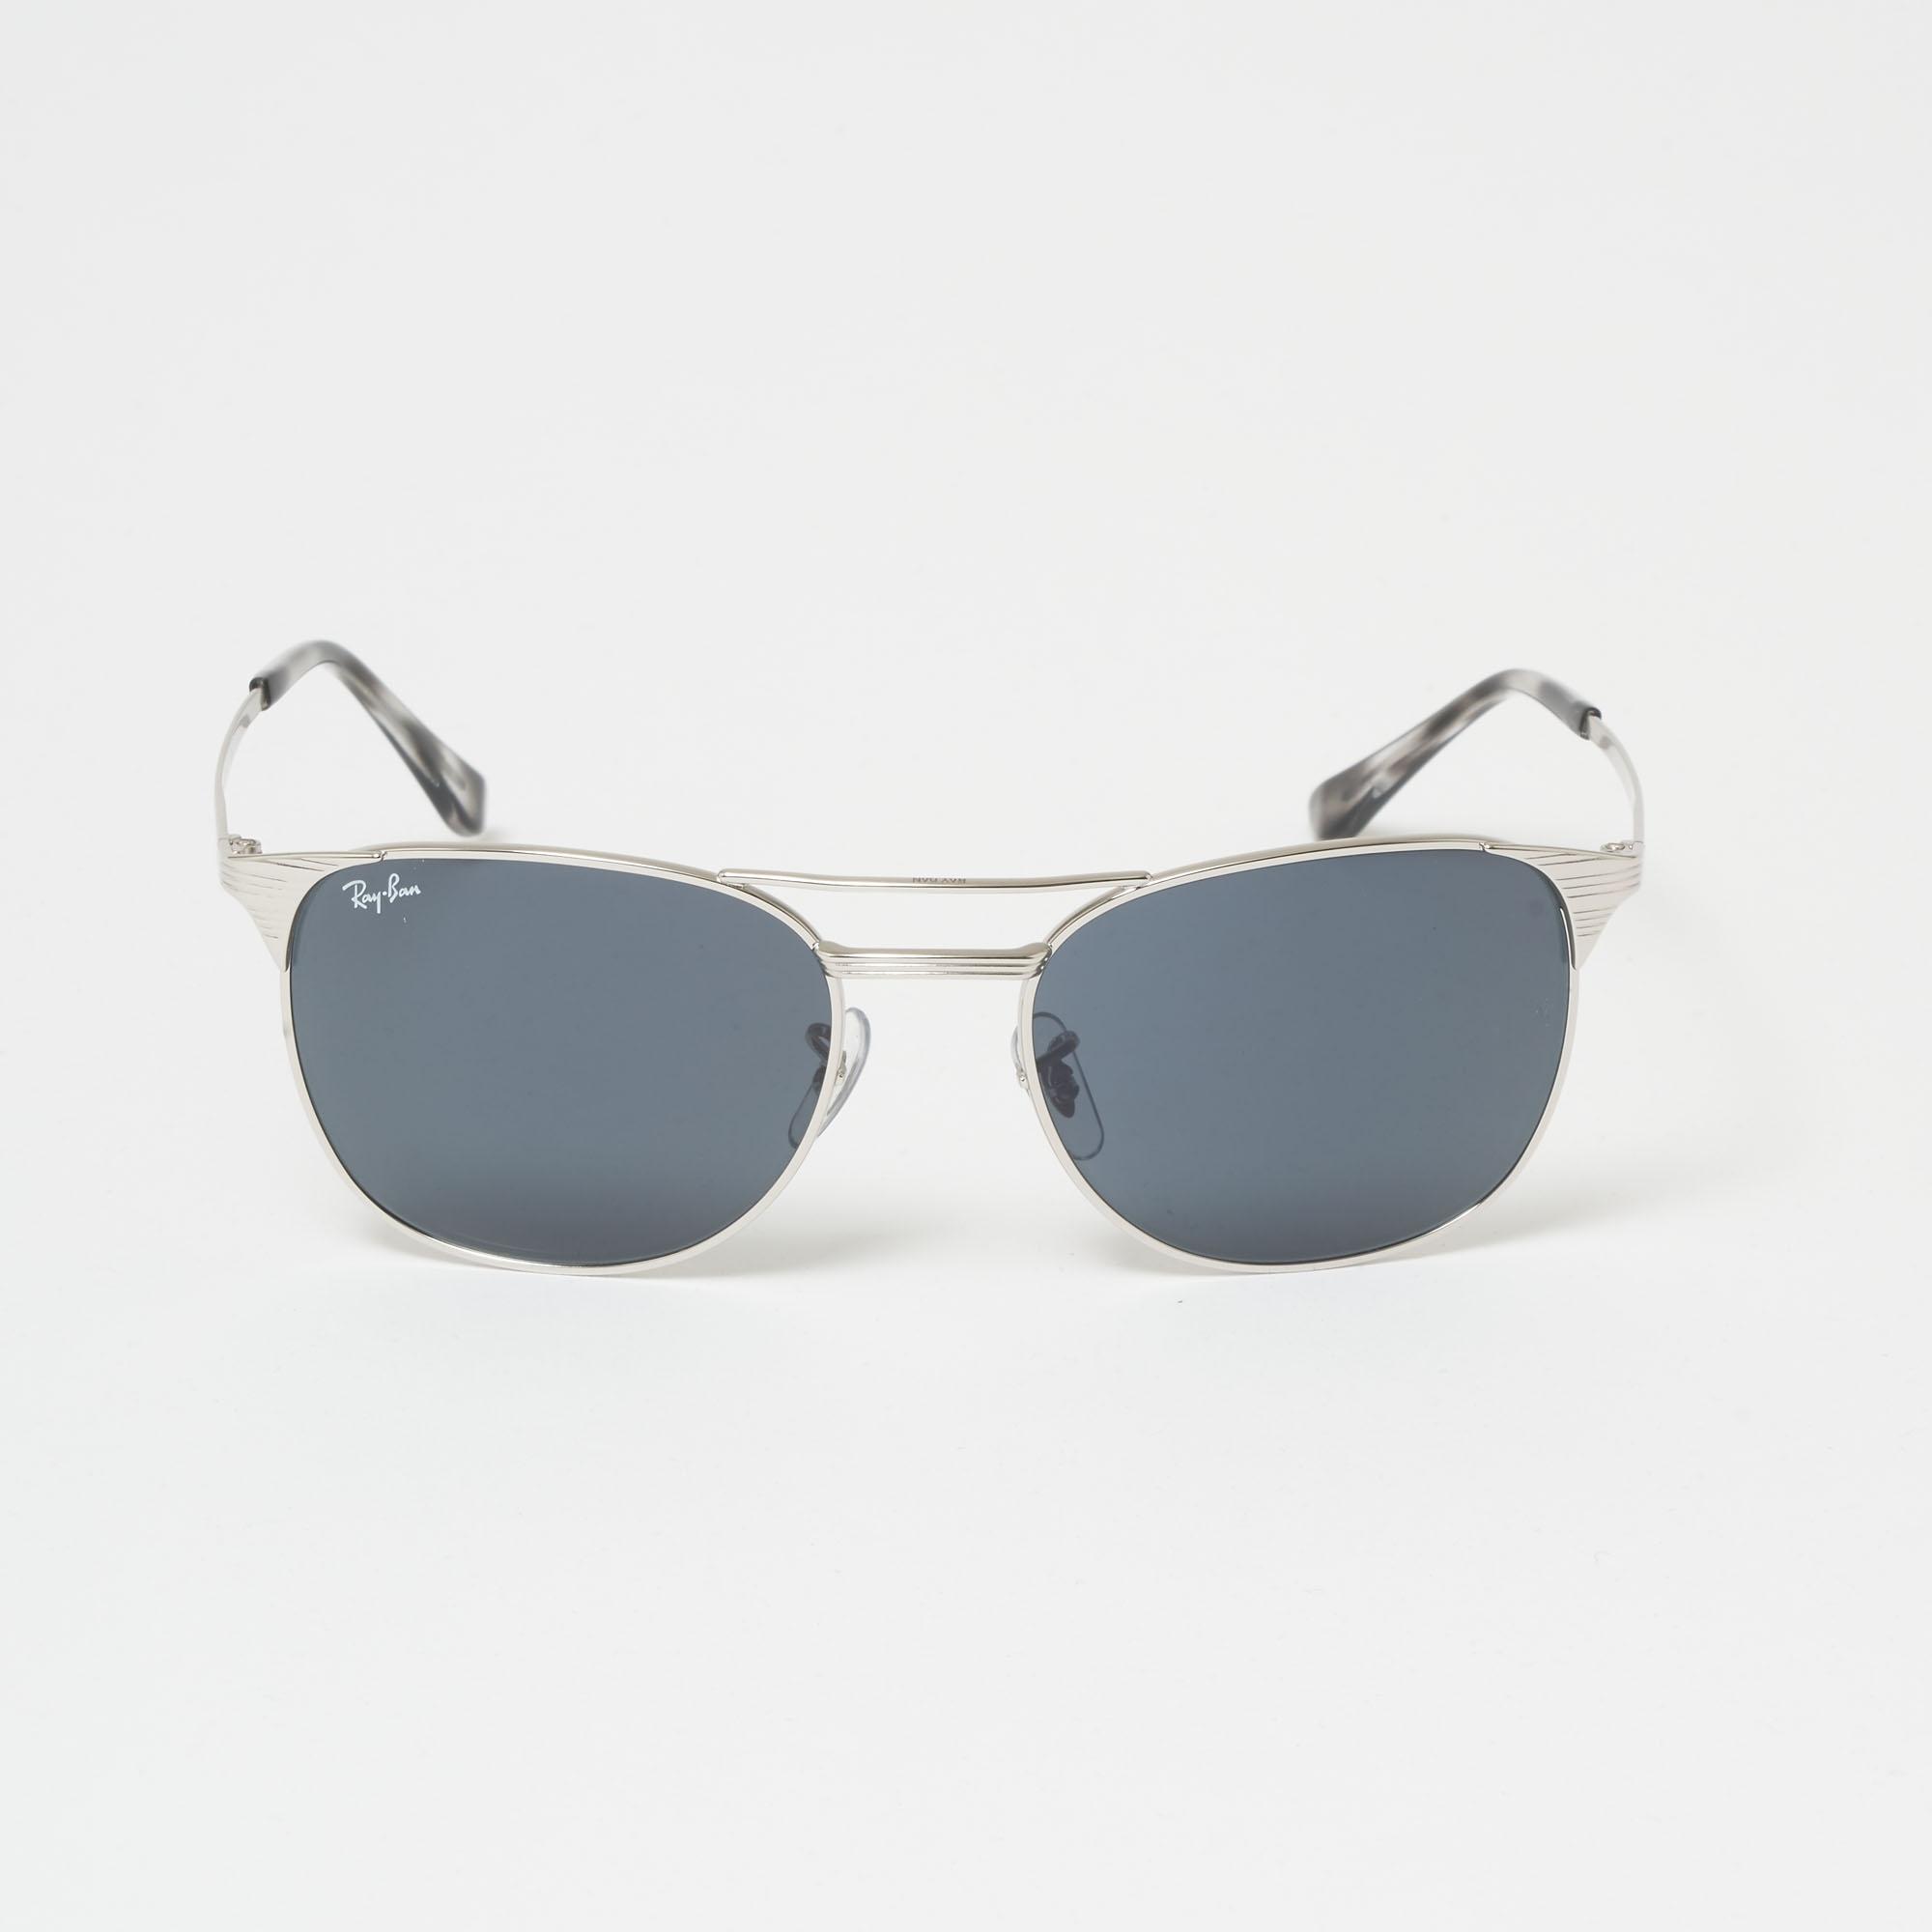 a327b7338c Chrome Signet Sunglasses - Blue Gray Classic Lenses